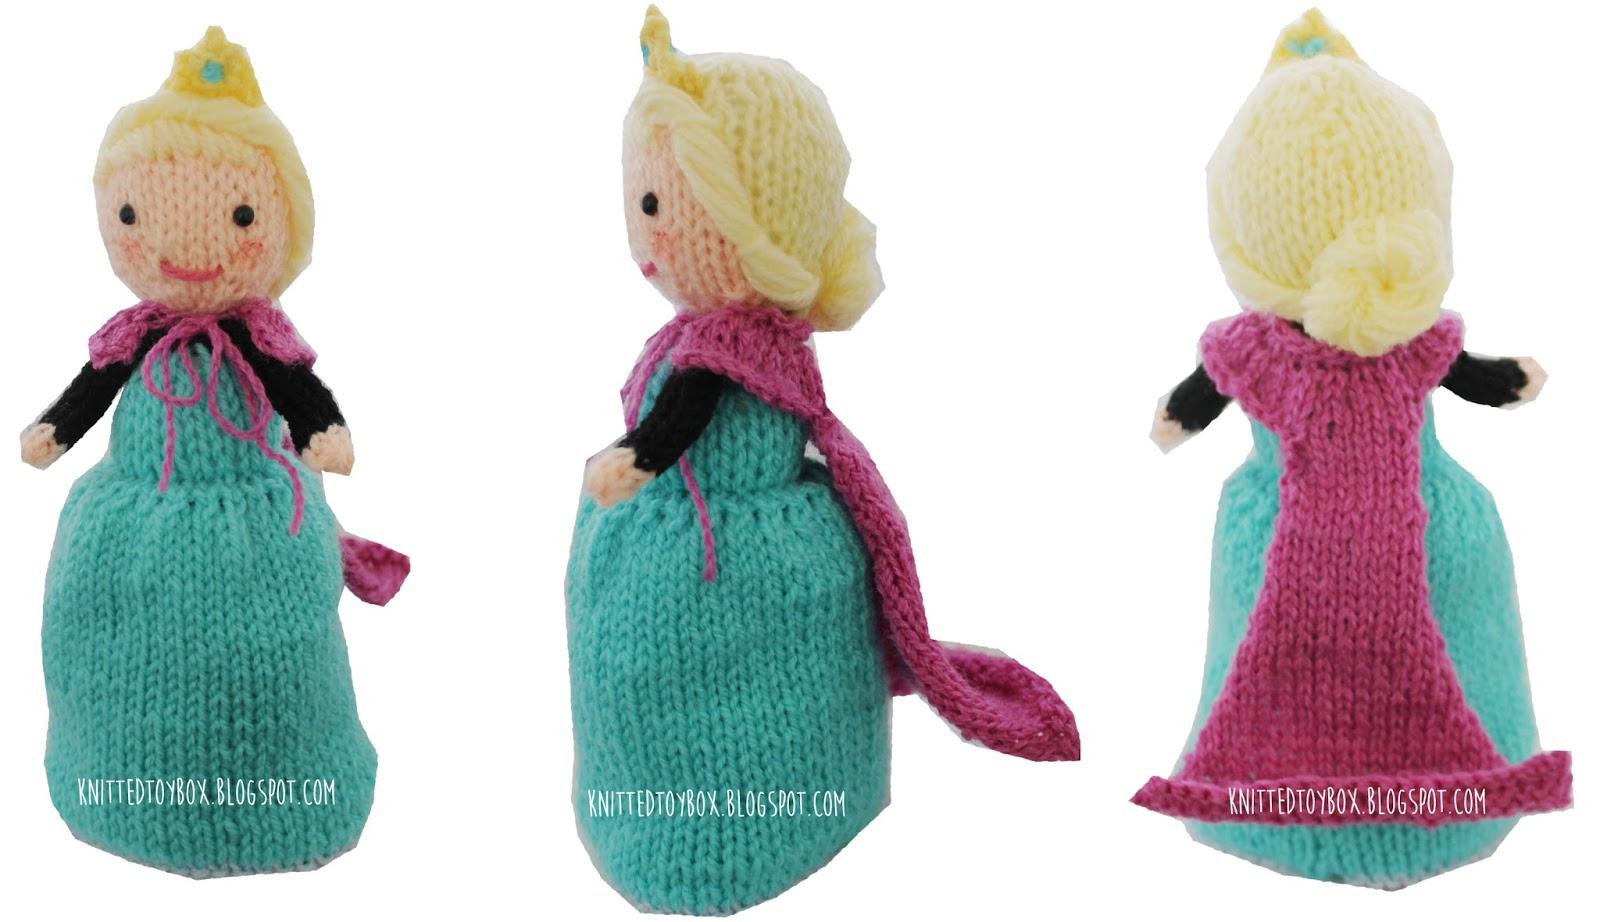 Knitted Toy Box: Elsa Frozen Flip Doll